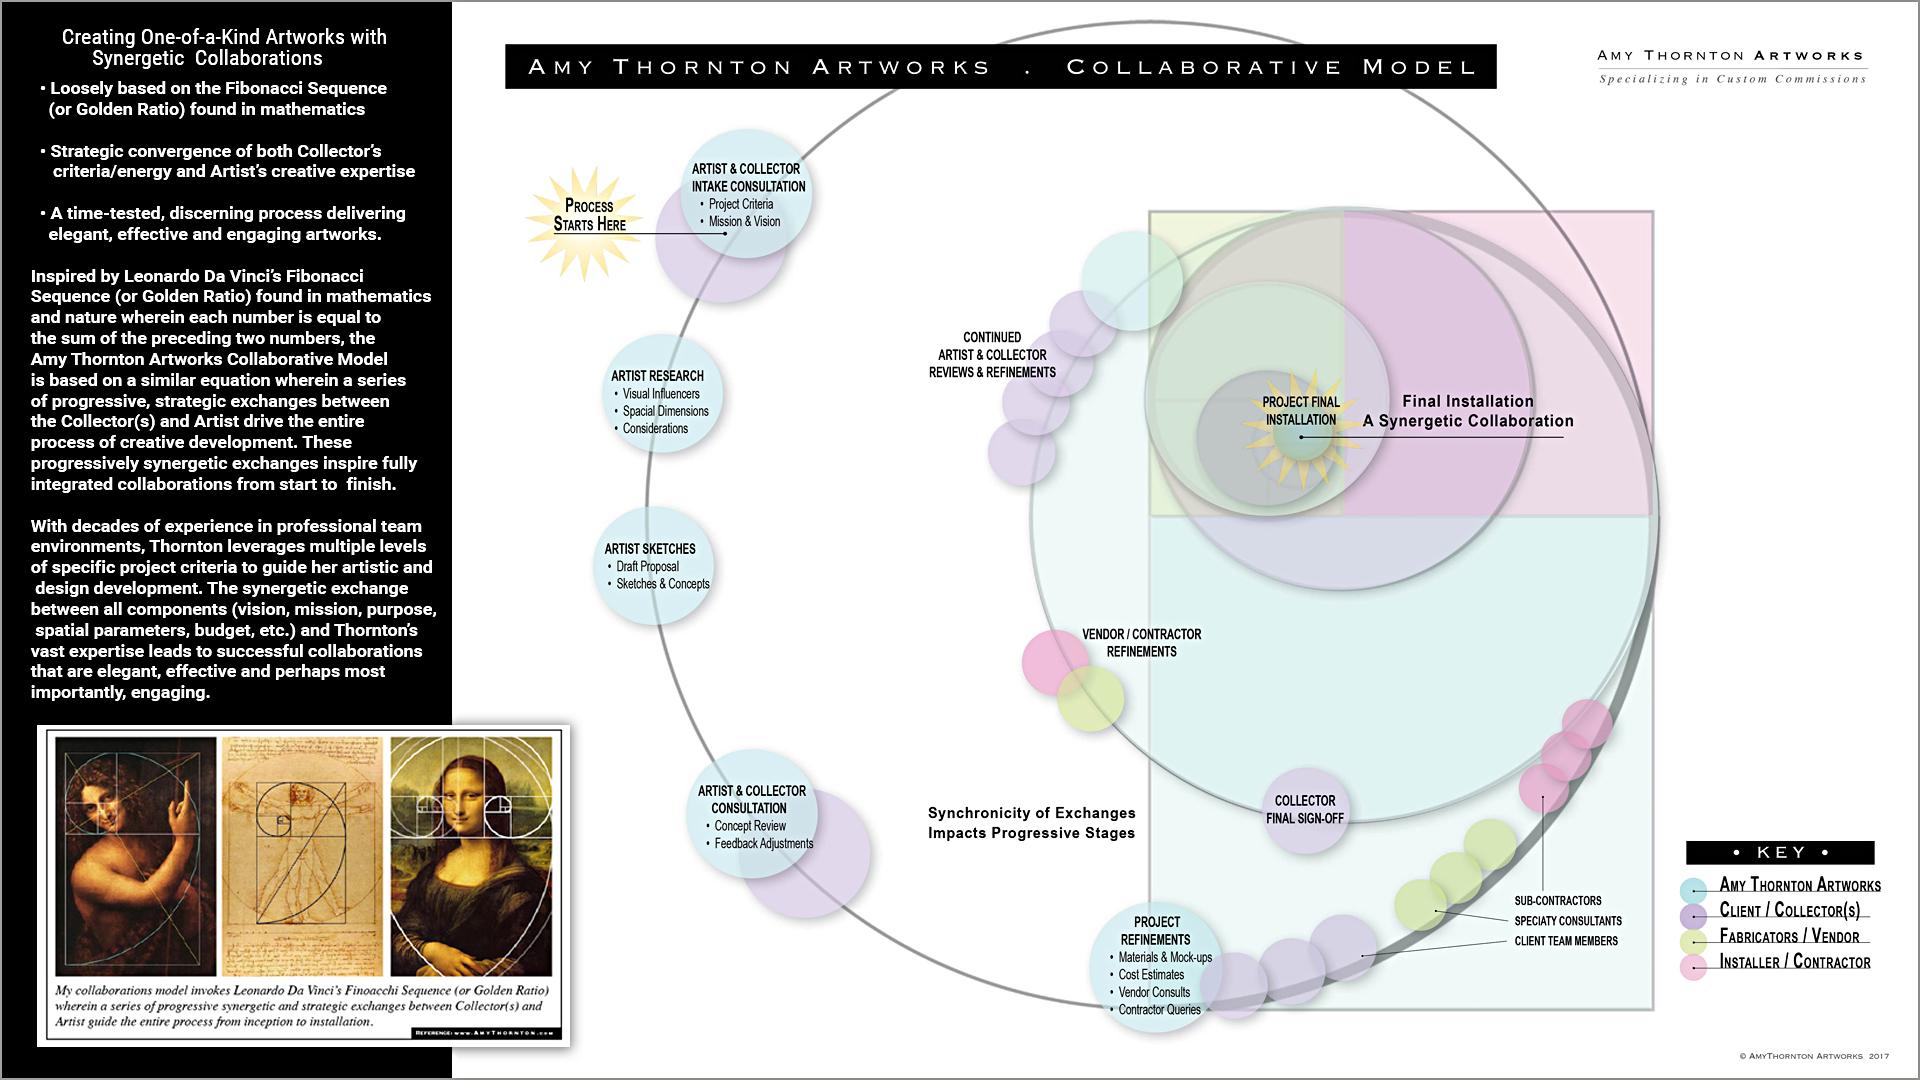 Amy Thornton Artworks Collaborative Model